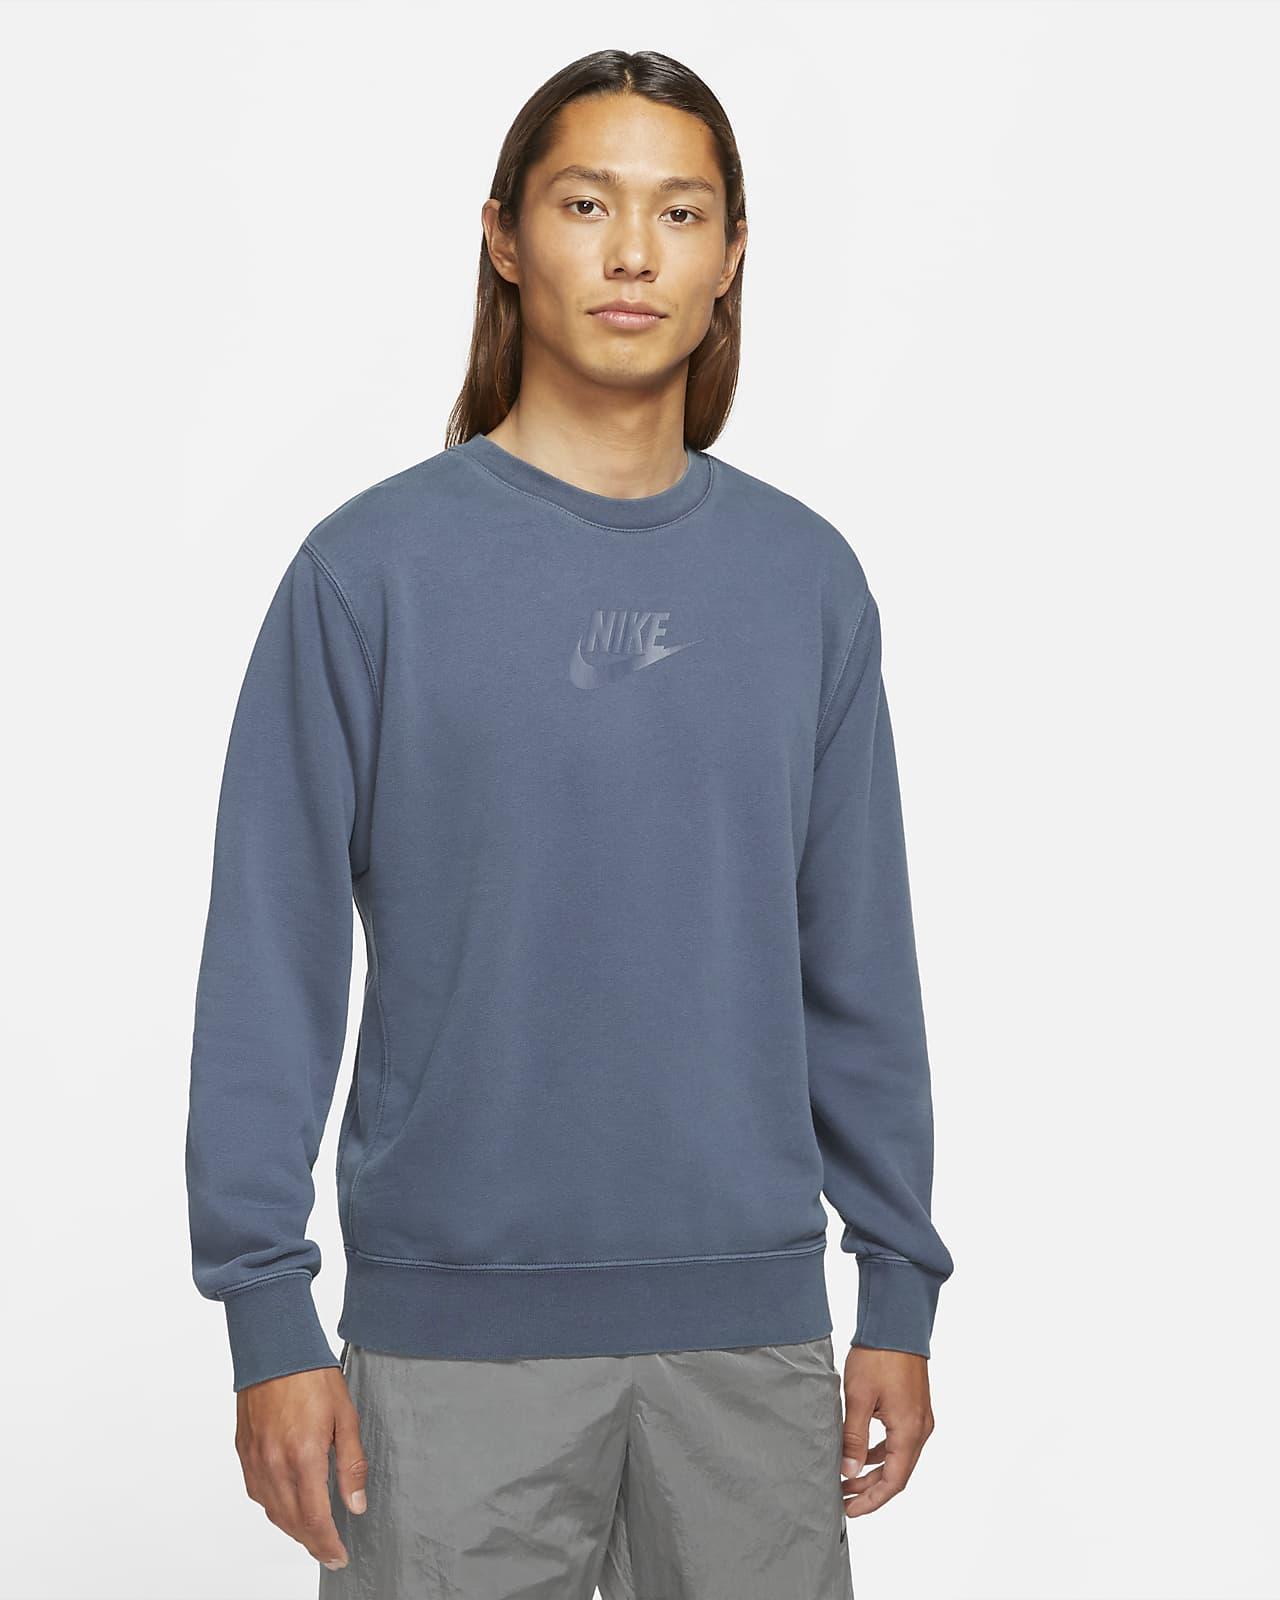 Nike Sportswear Essentials+ Men's French Terry Crew Sweatshirt